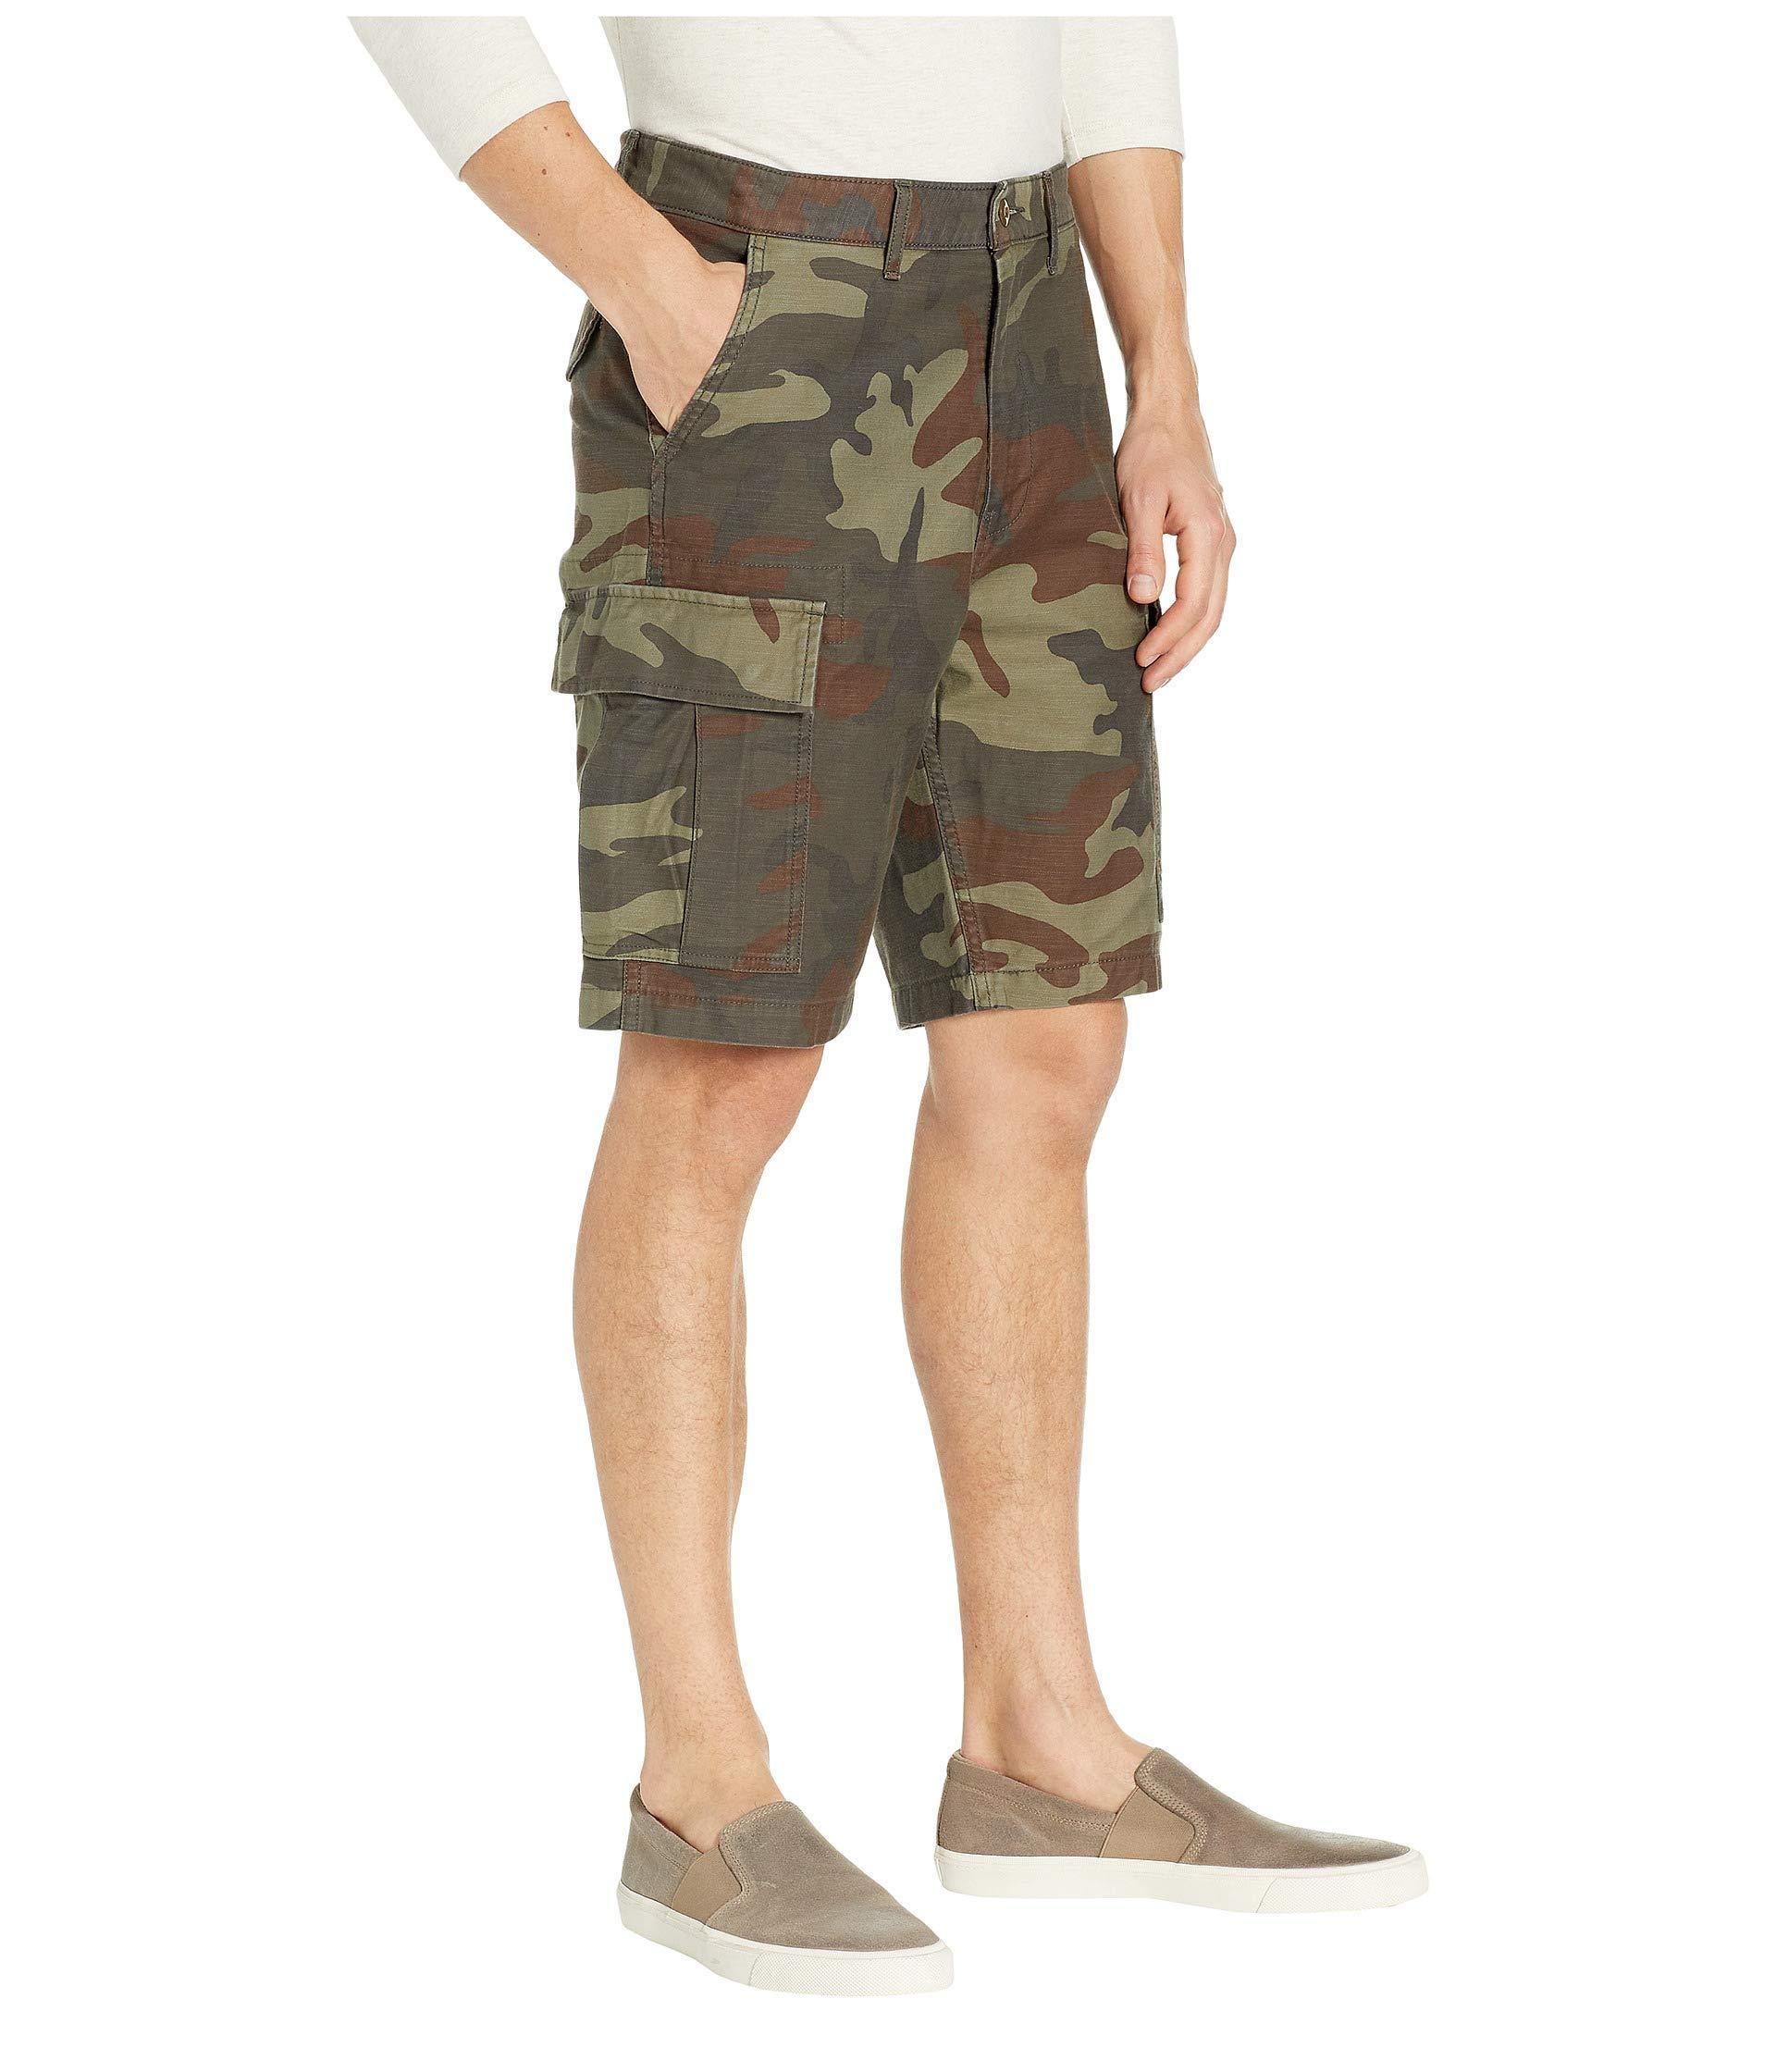 2a791b2fa8 Levi's Levi's(r) Mens Carrier Cargo Shorts (black/ripstop) Men's ...